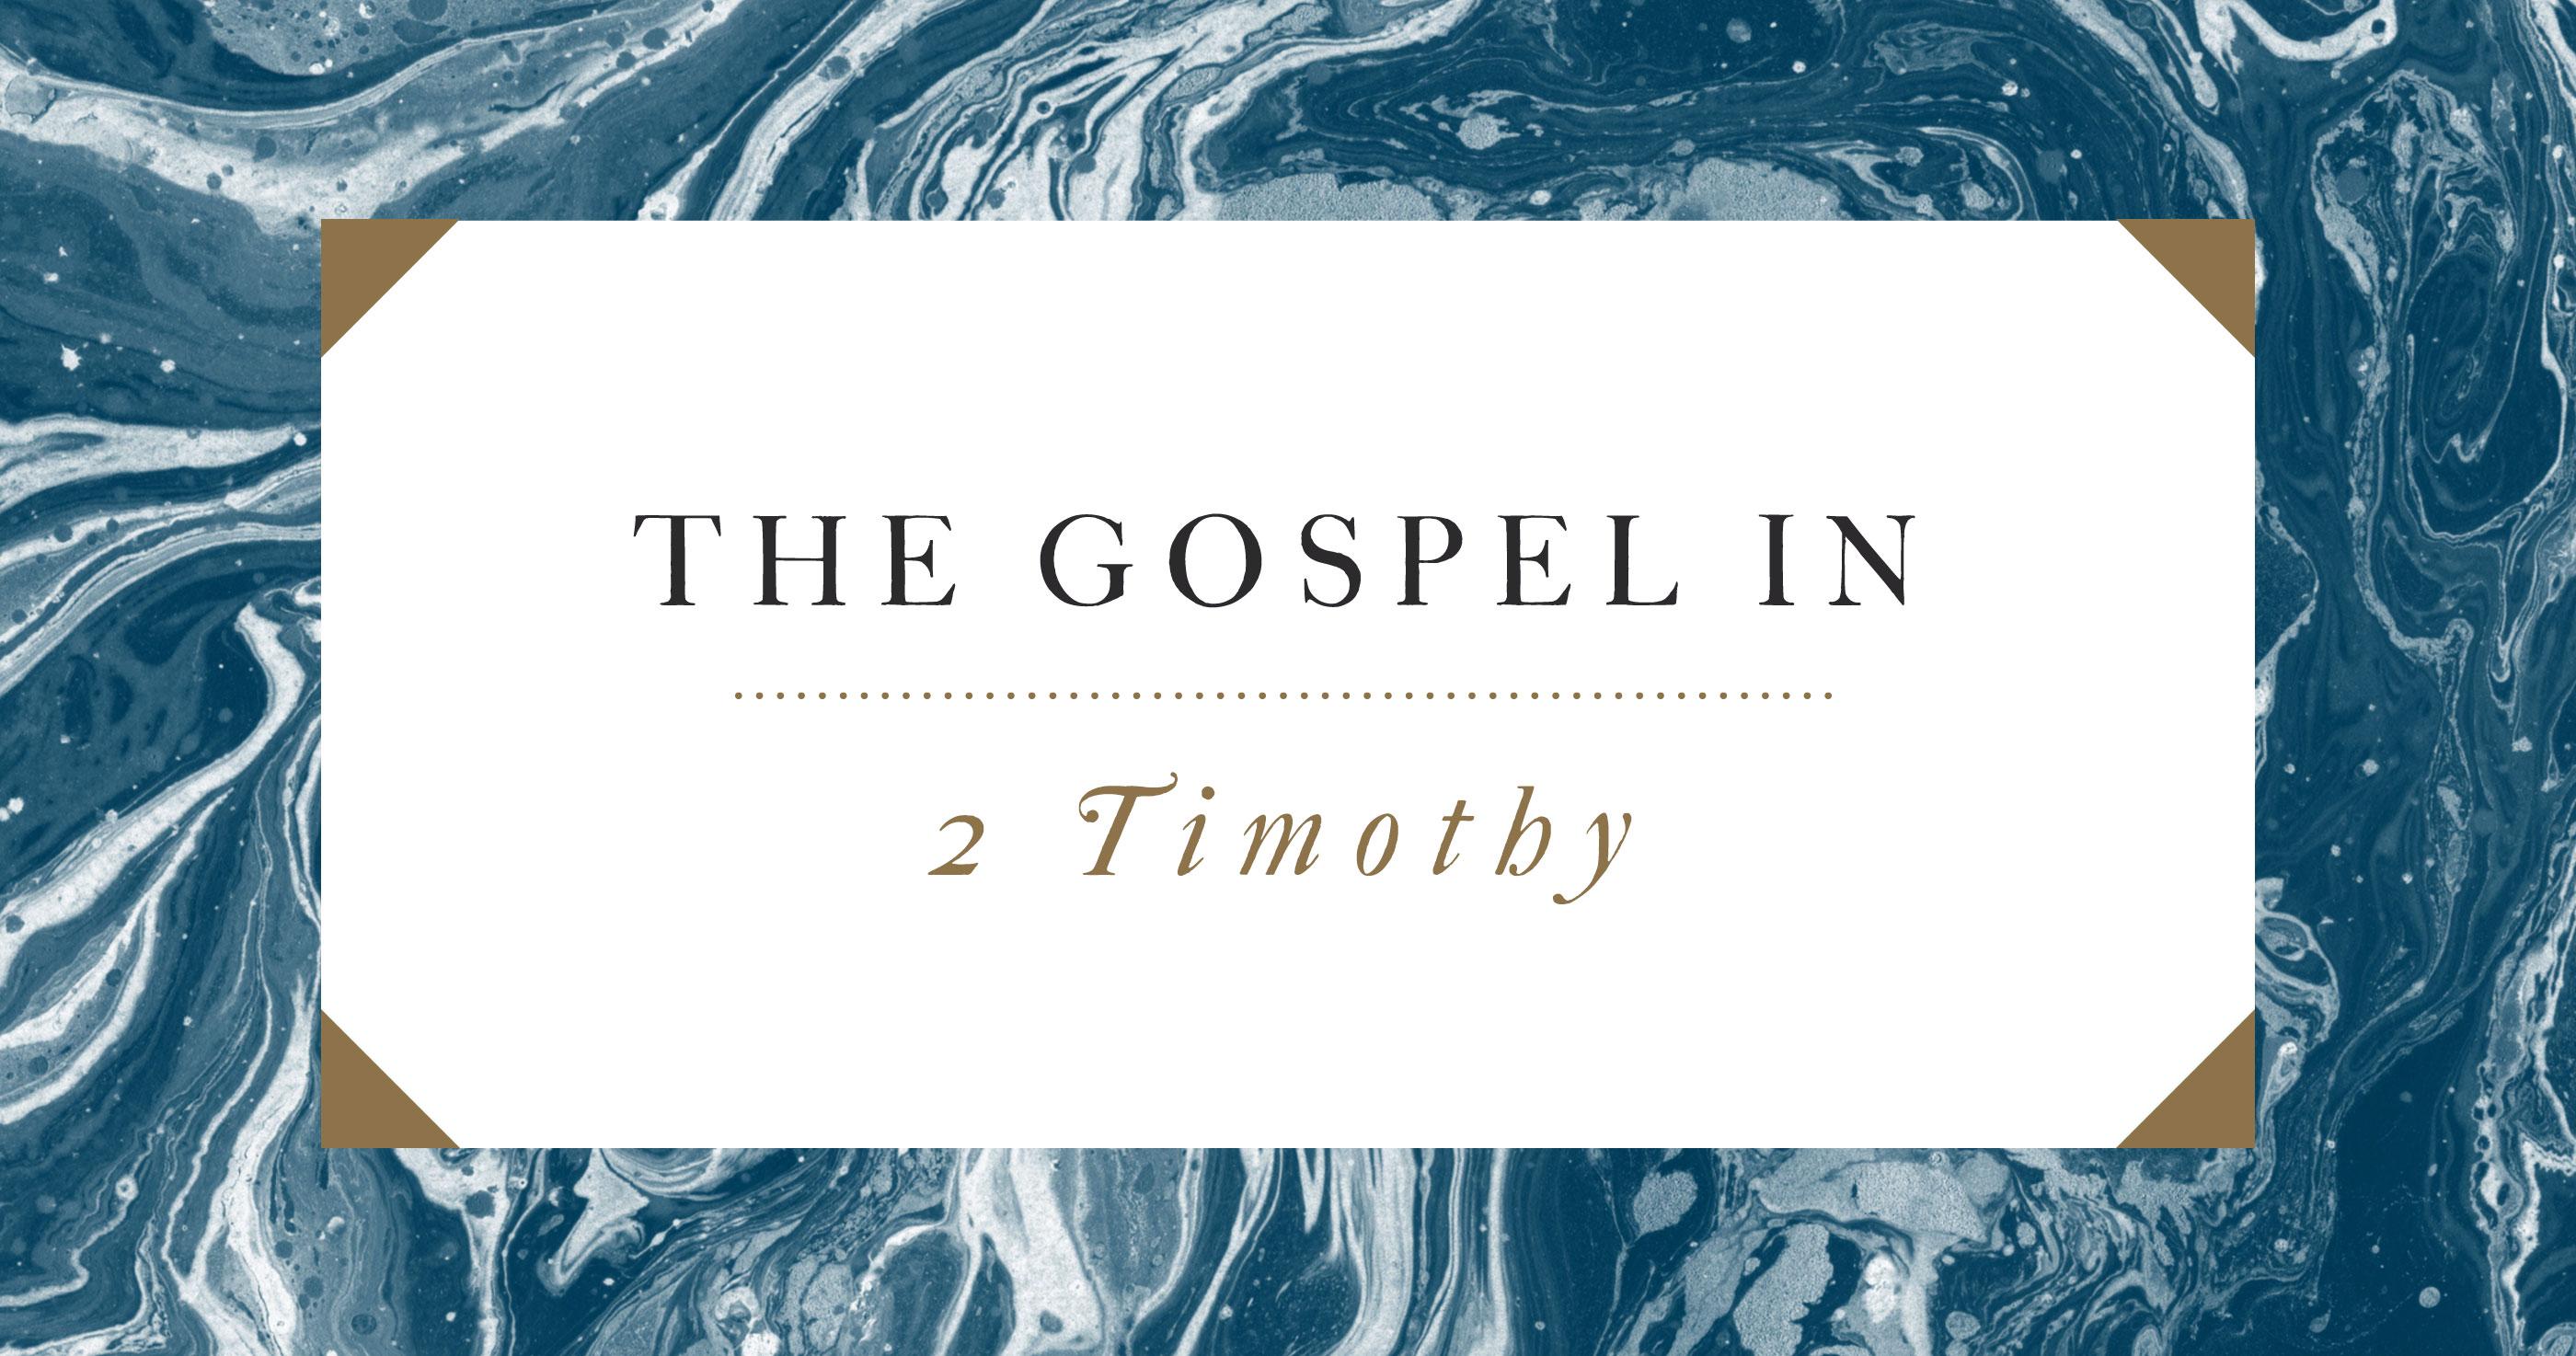 The Gospel in 2 Timothy